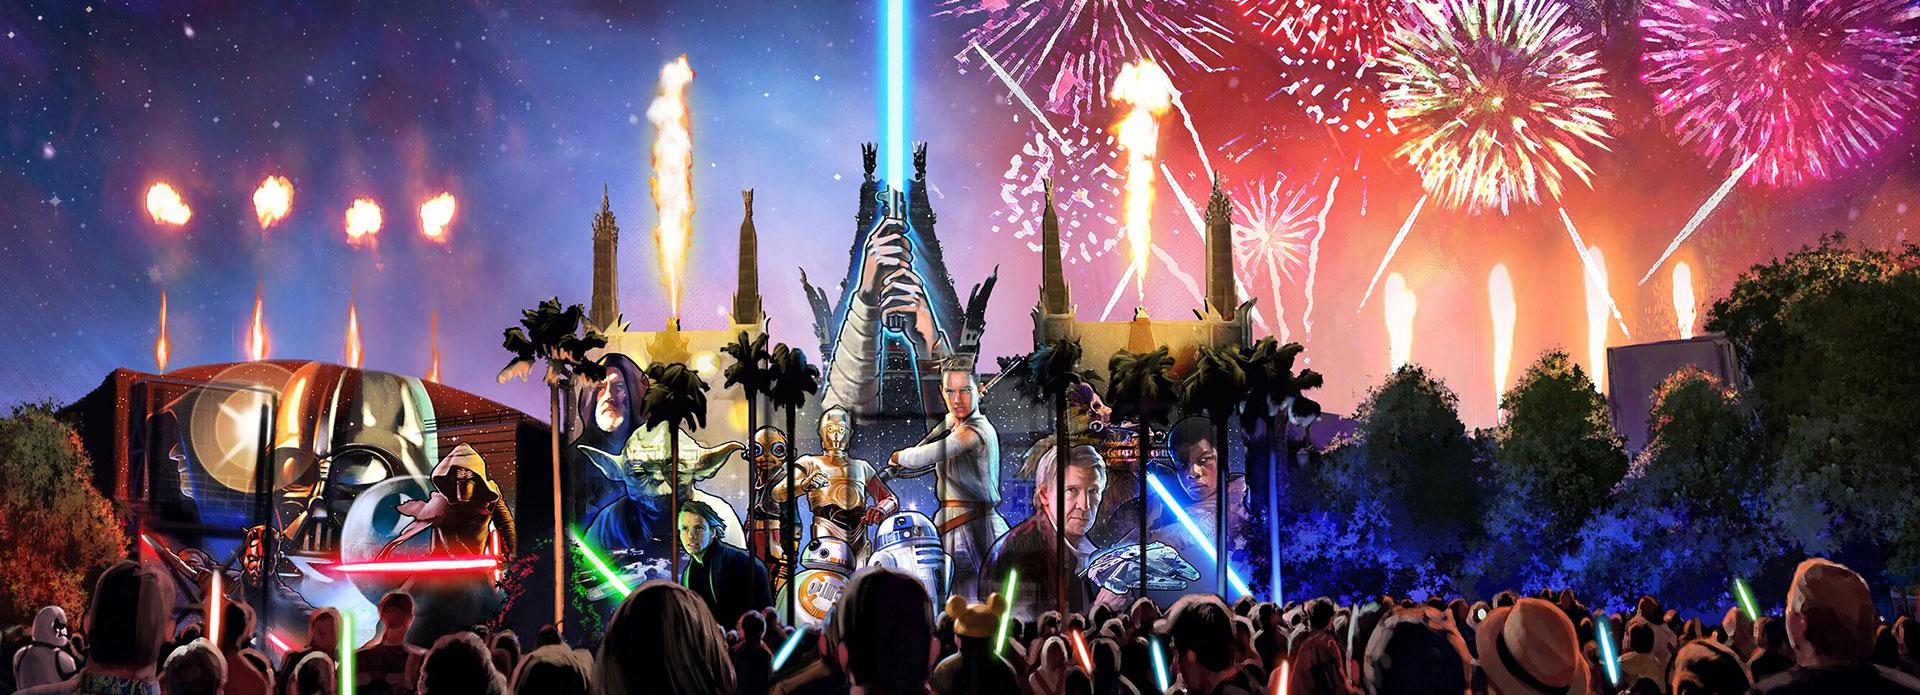 Walt Disney 50th Anniversary of Orlando, Florida Resort